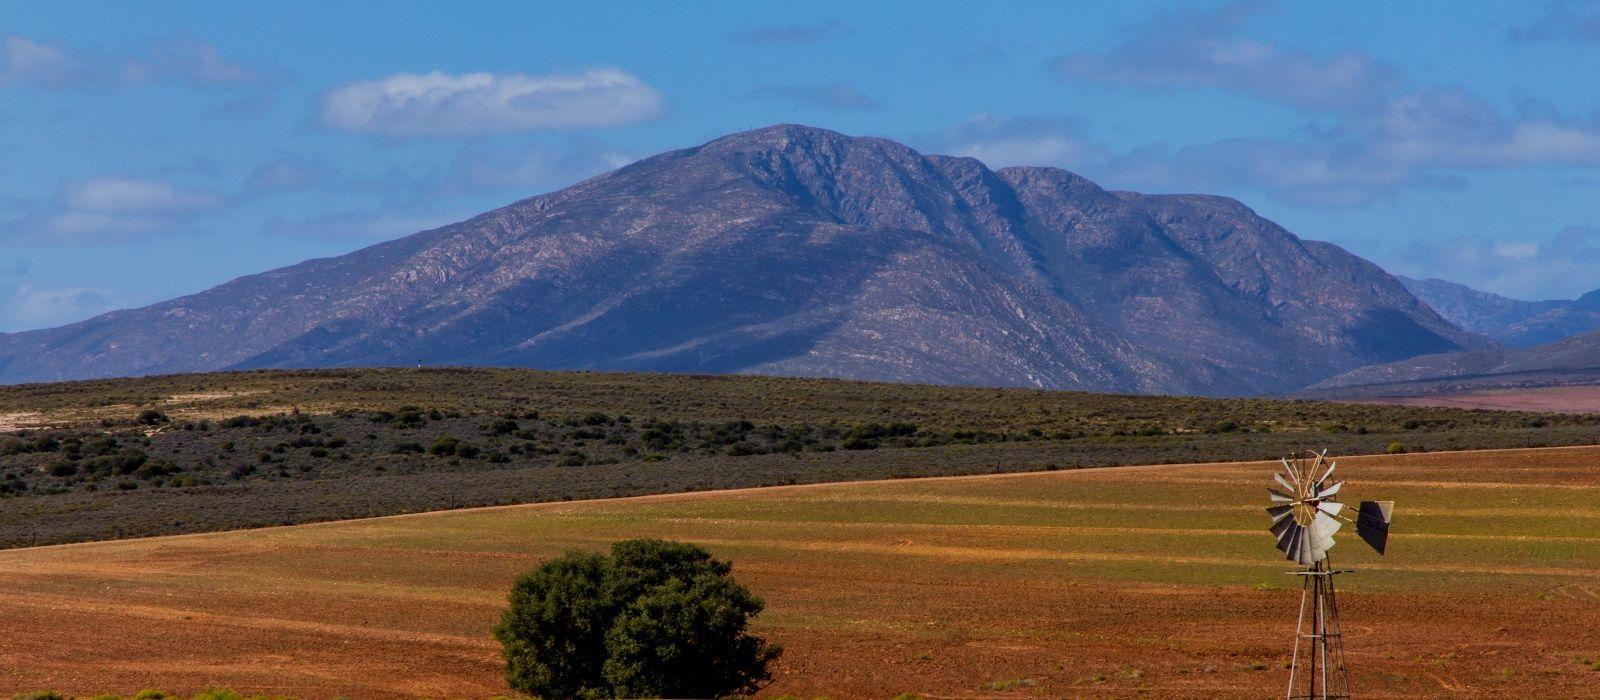 Destination Karoo South Africa